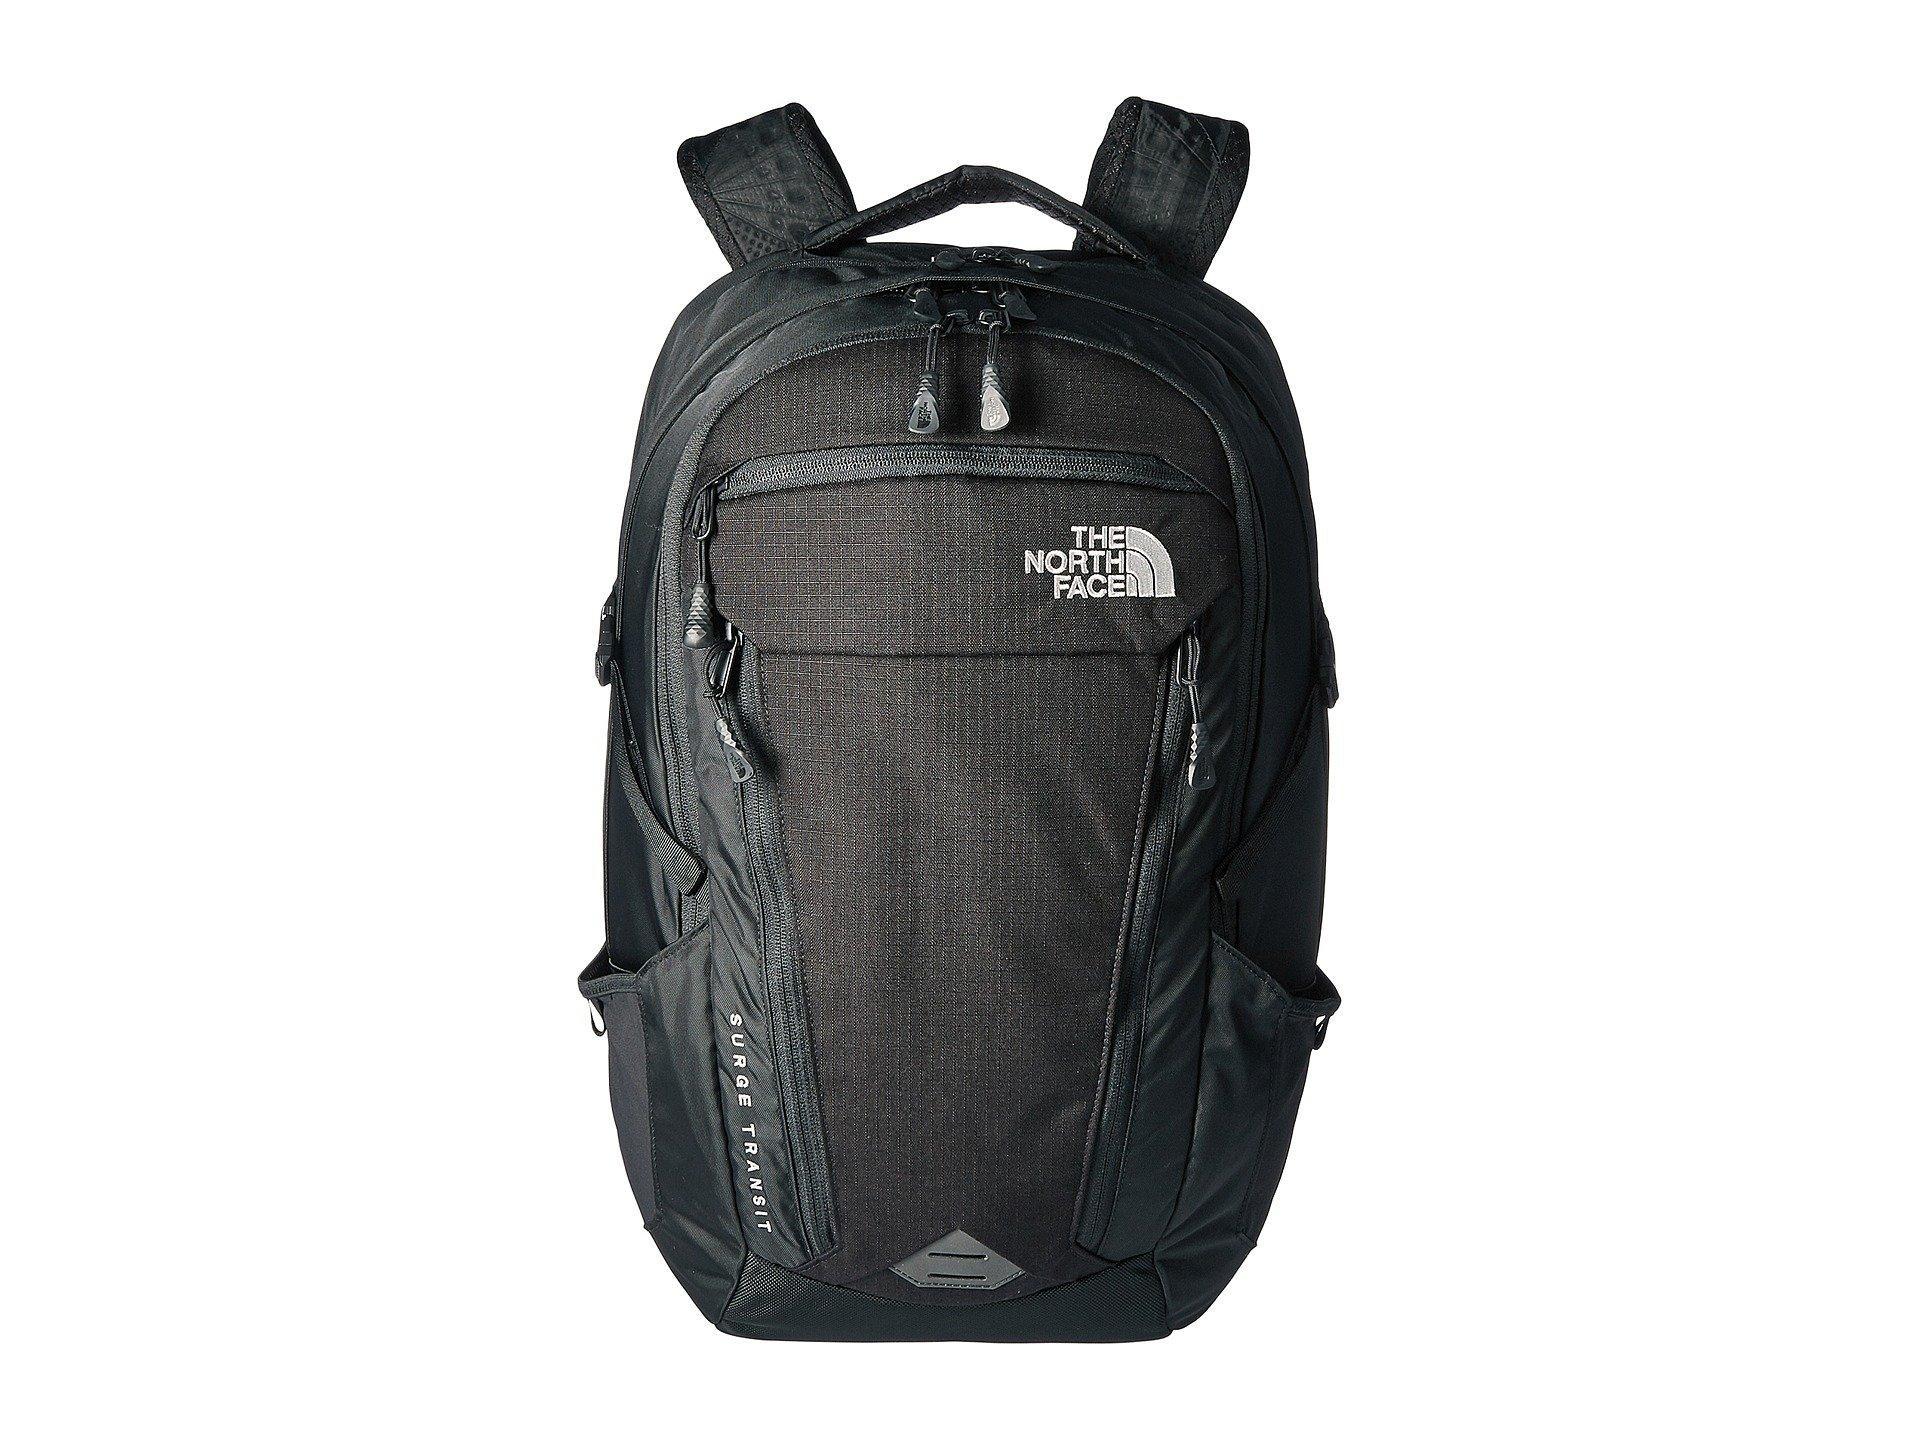 8fd234870 Women's Surge Transit Backpack (tnf Black) Backpack Bags